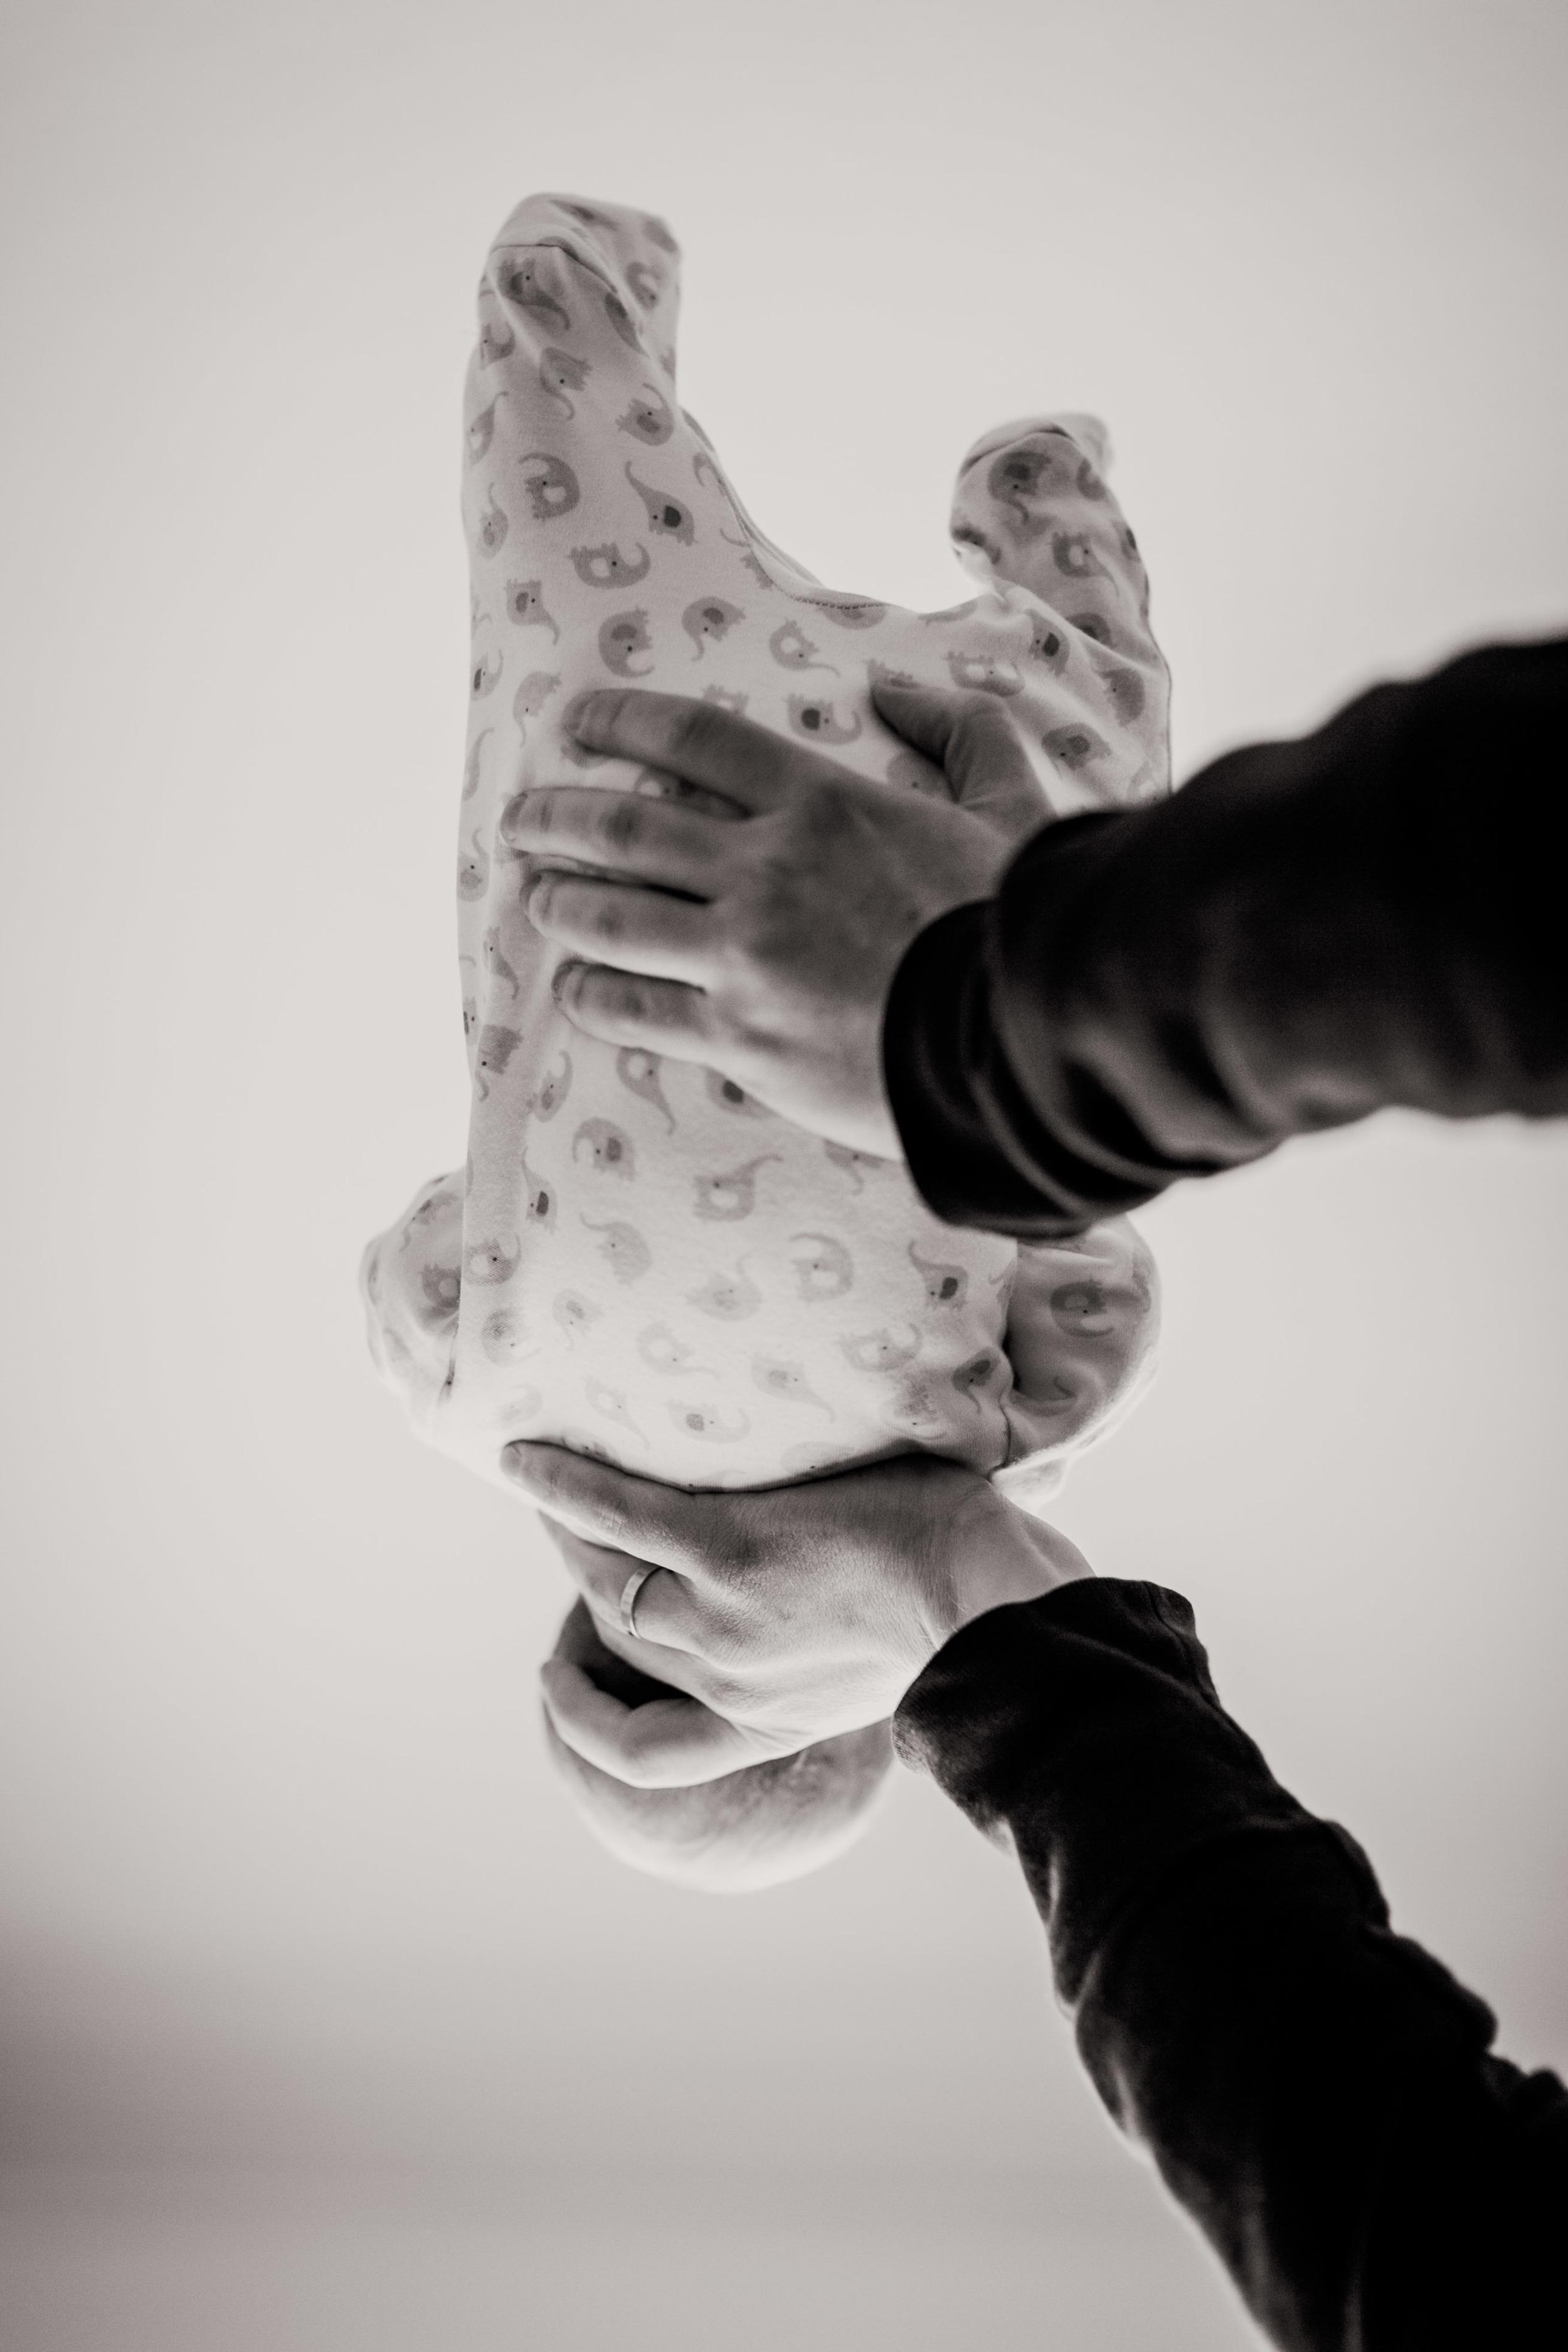 Babyshooting_Berlin_Hochzeitsfotografie_Fran Burrows-27.jpg